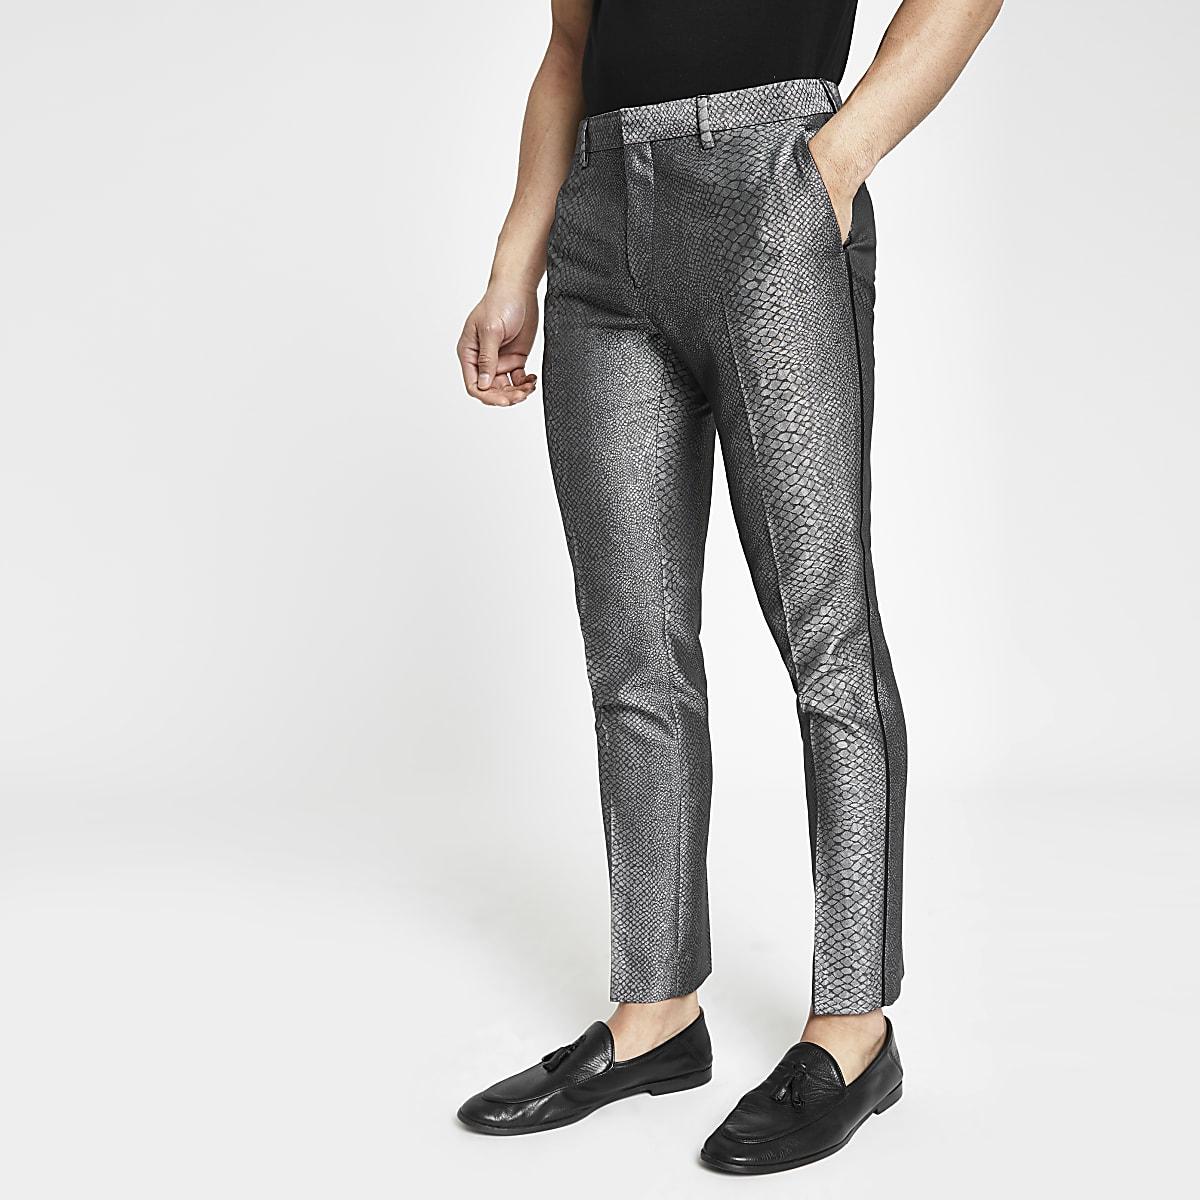 Pantalon skinny habillé motif peau de serpent gris